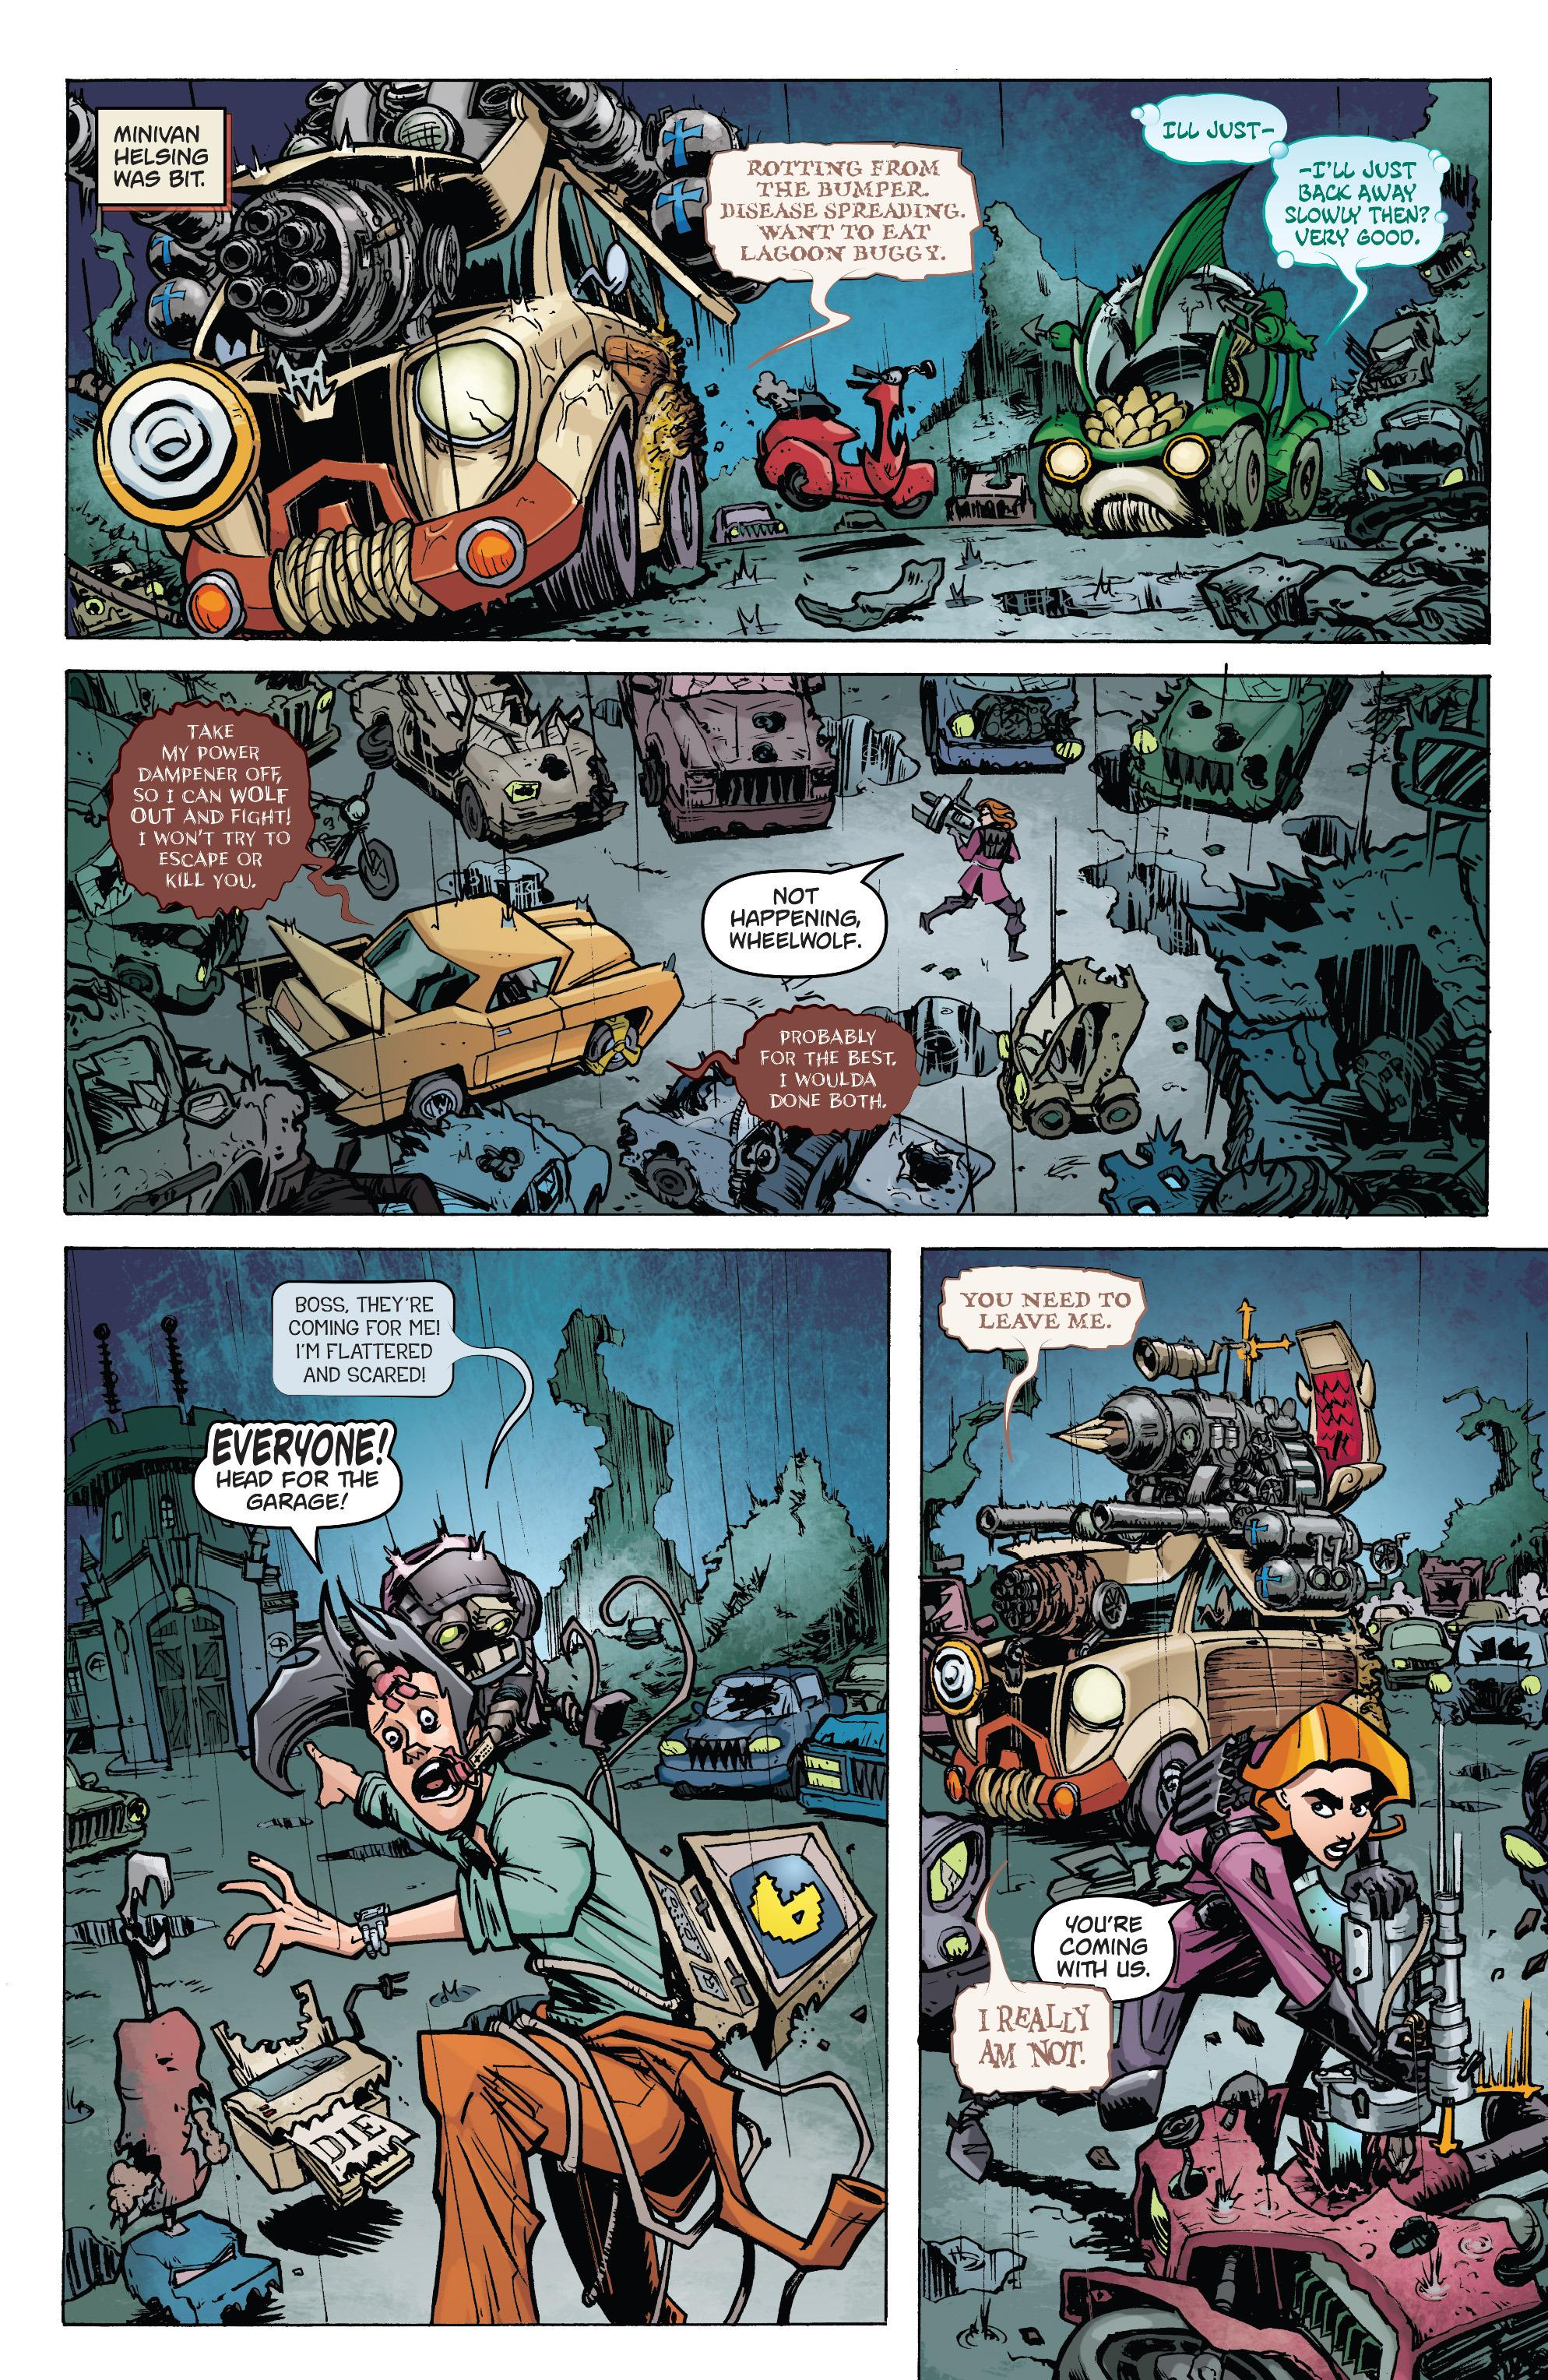 Read online Monster Motors: The Curse of Minivan Helsing comic -  Issue #2 - 4